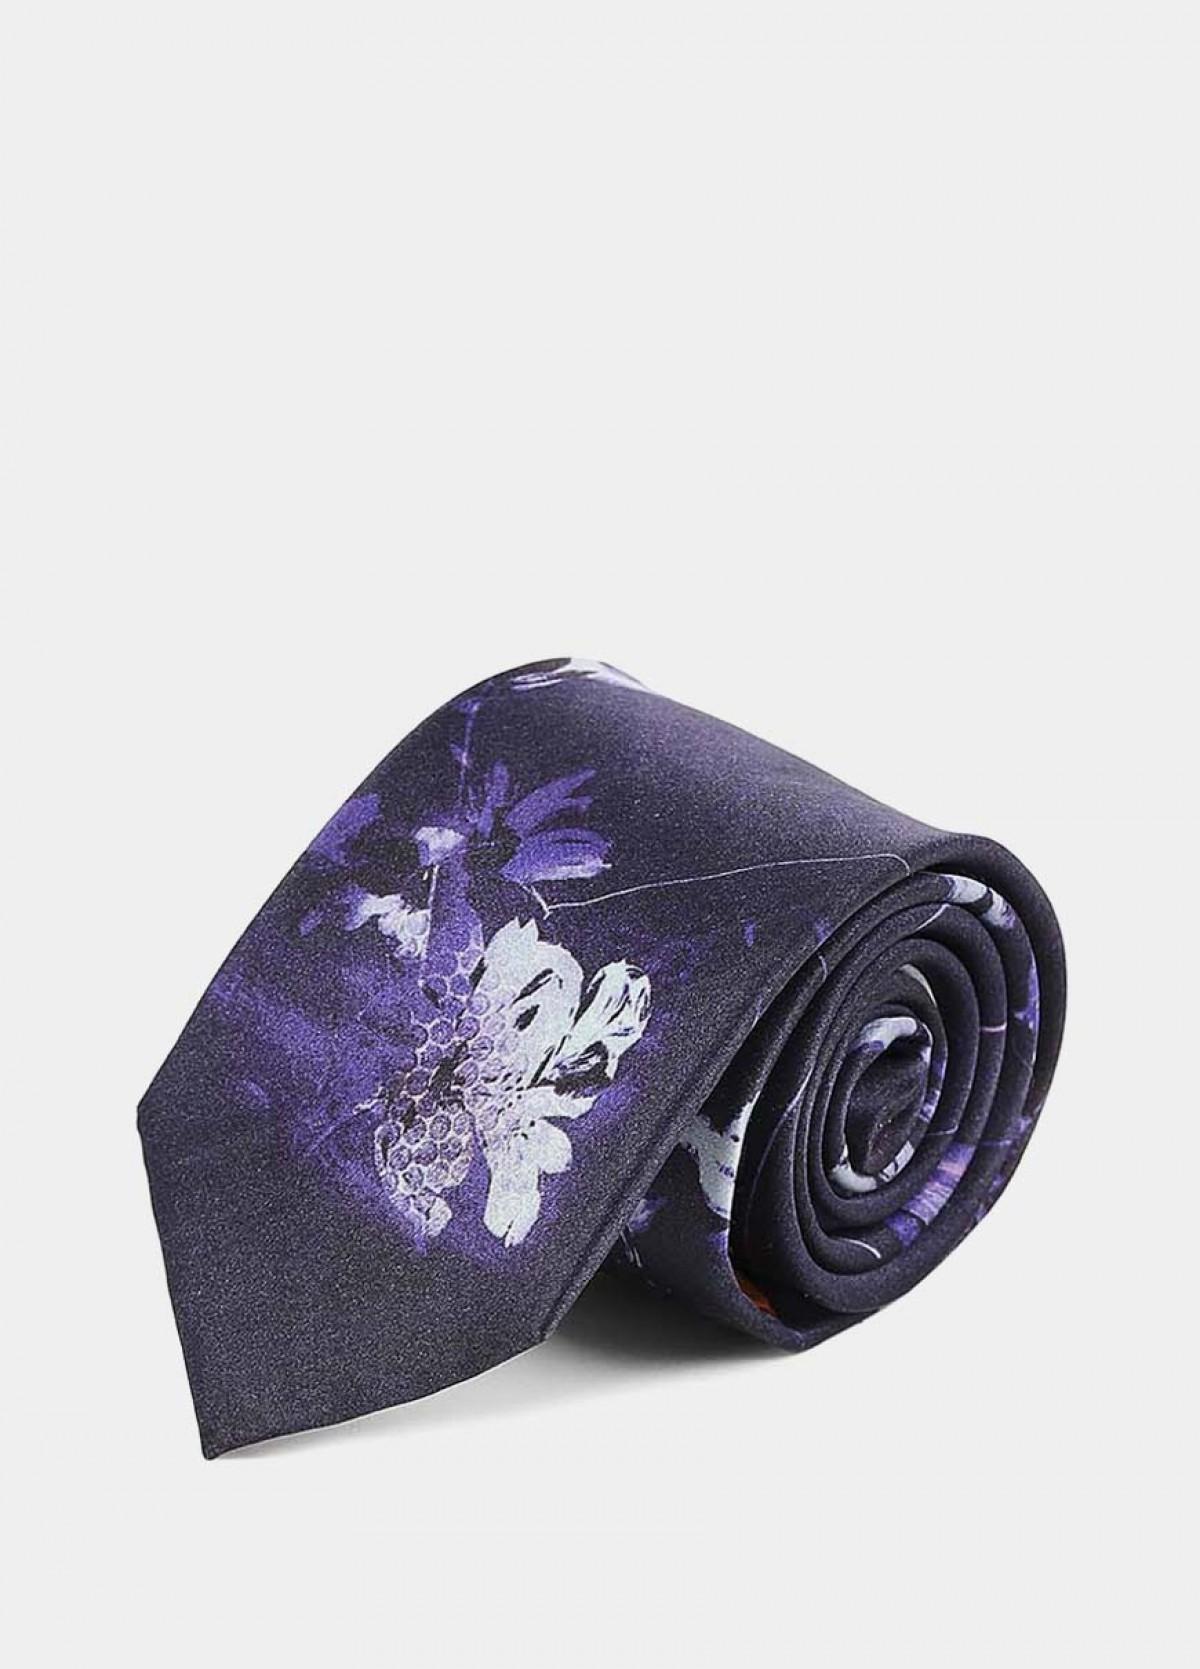 The Royal Blue Signature Tie